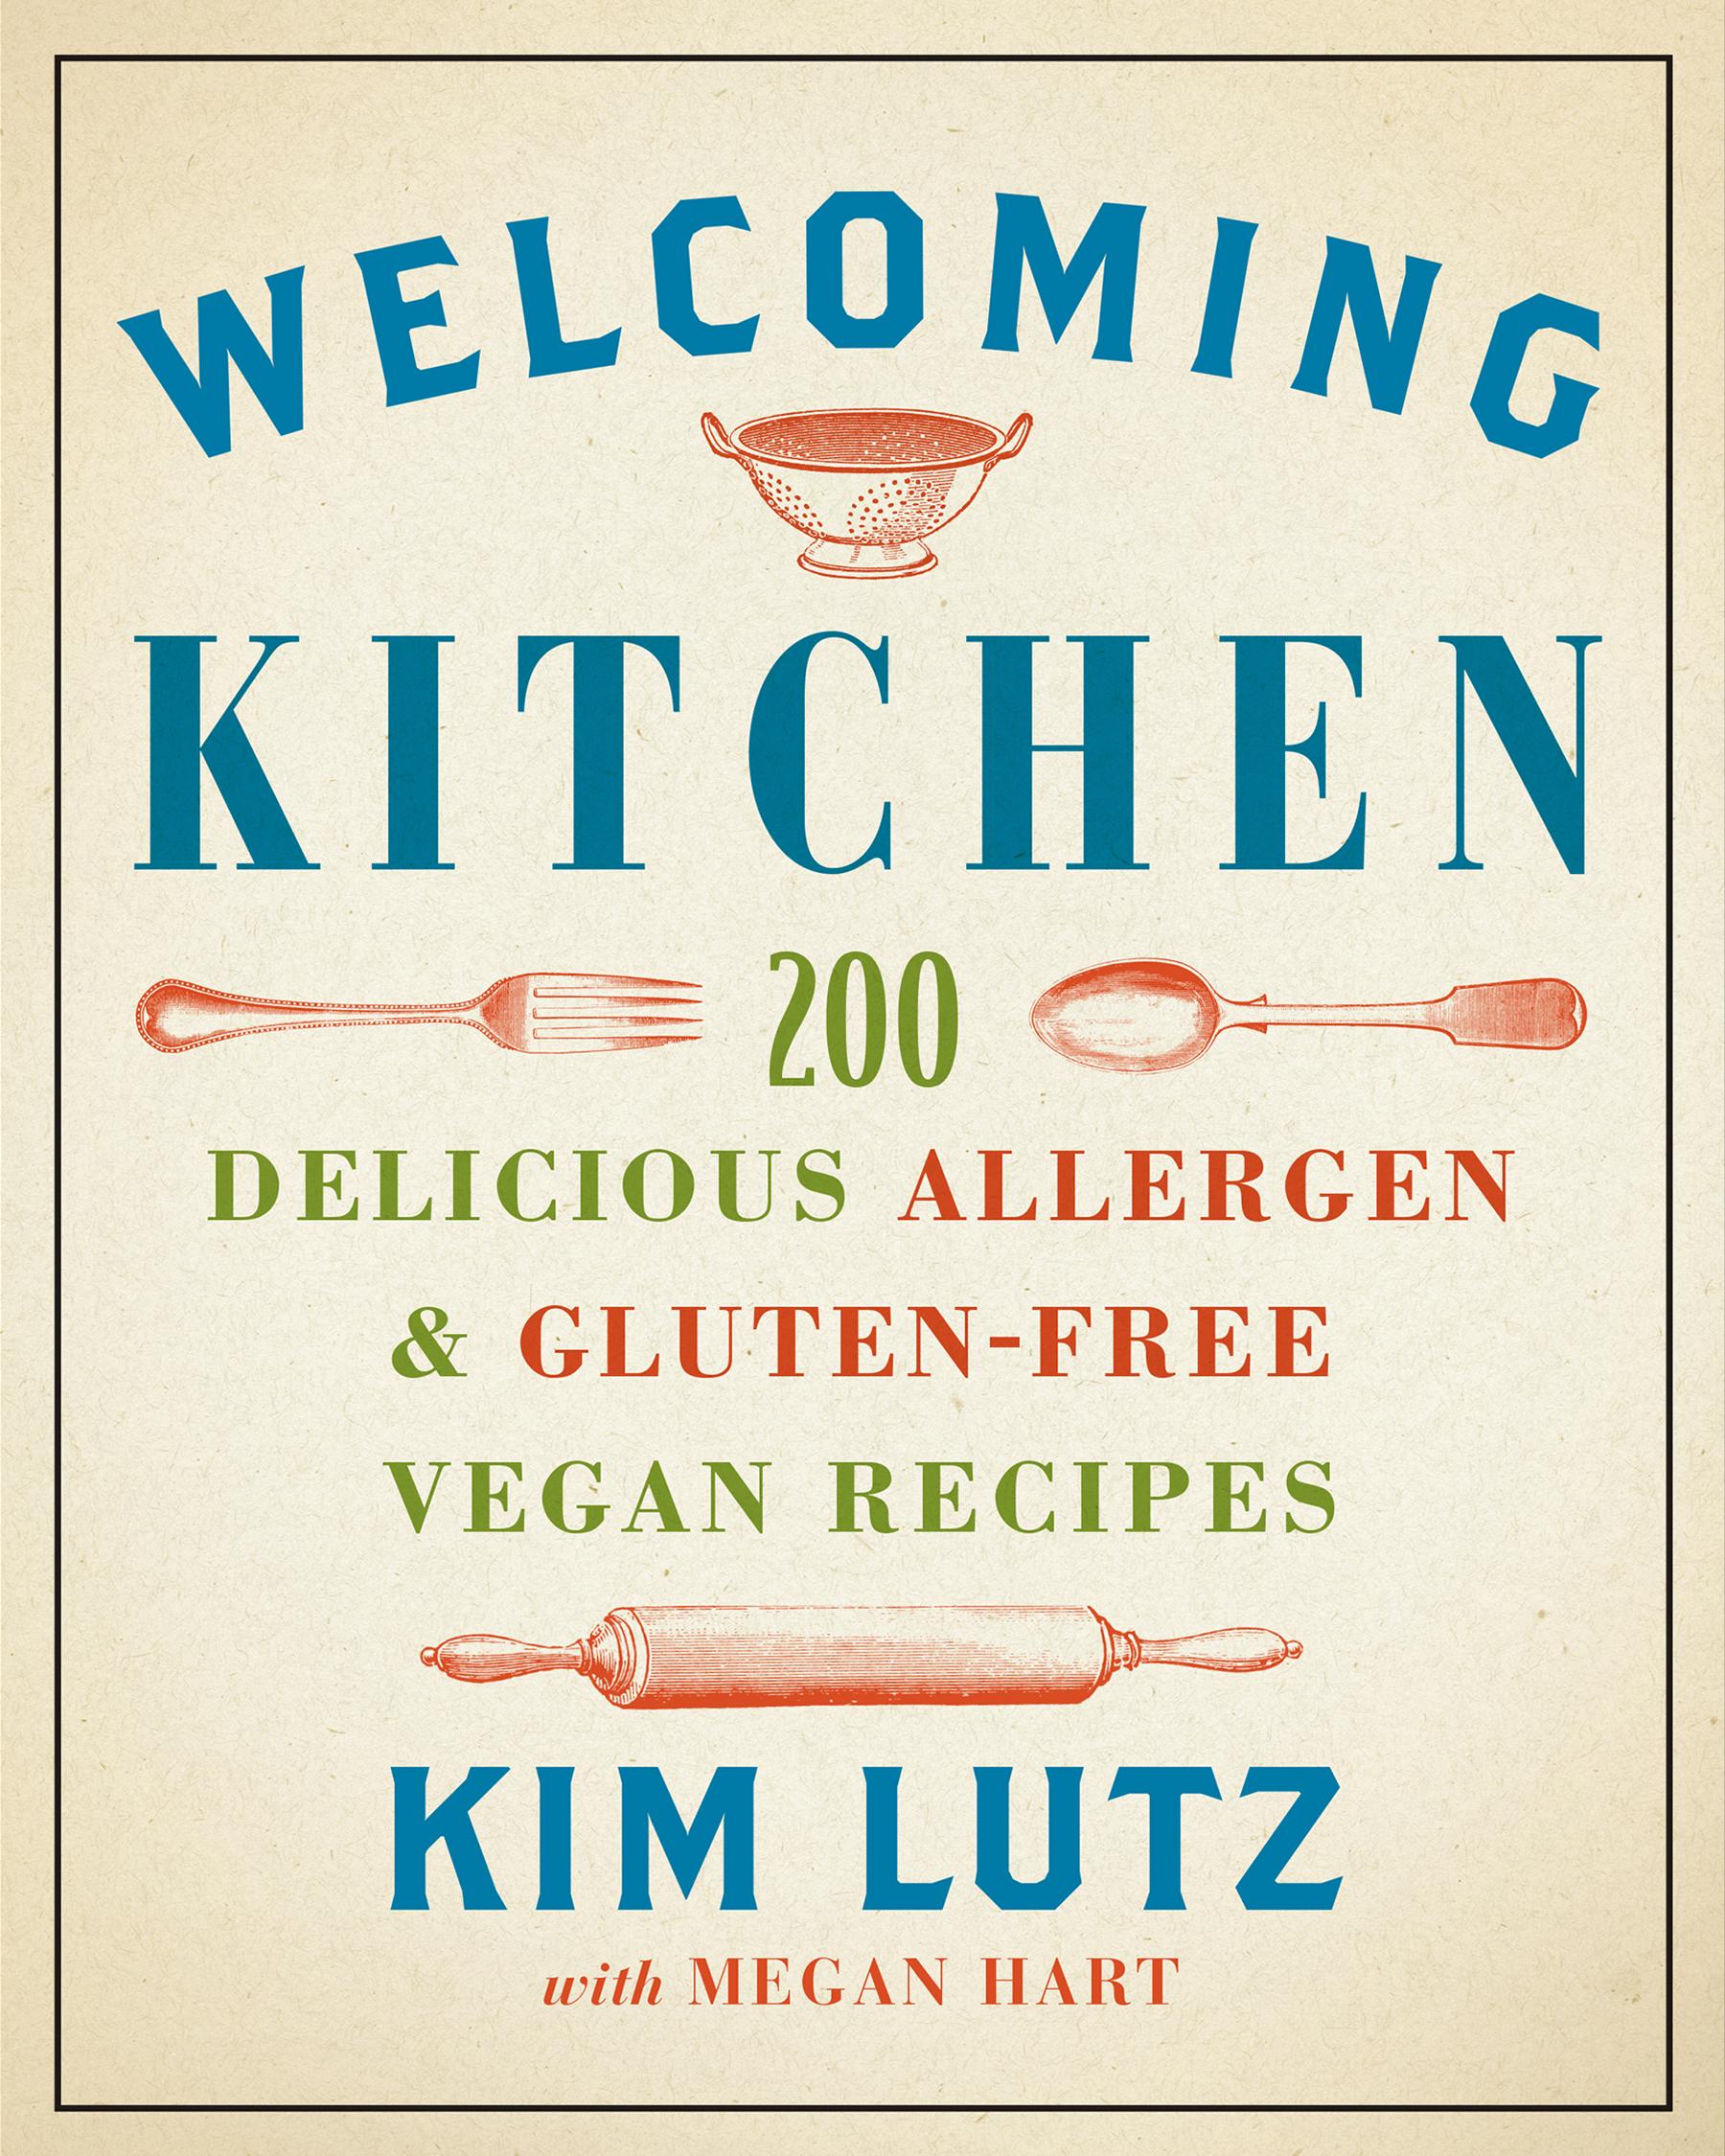 Welcoming Kitchen-0-cov.jpg